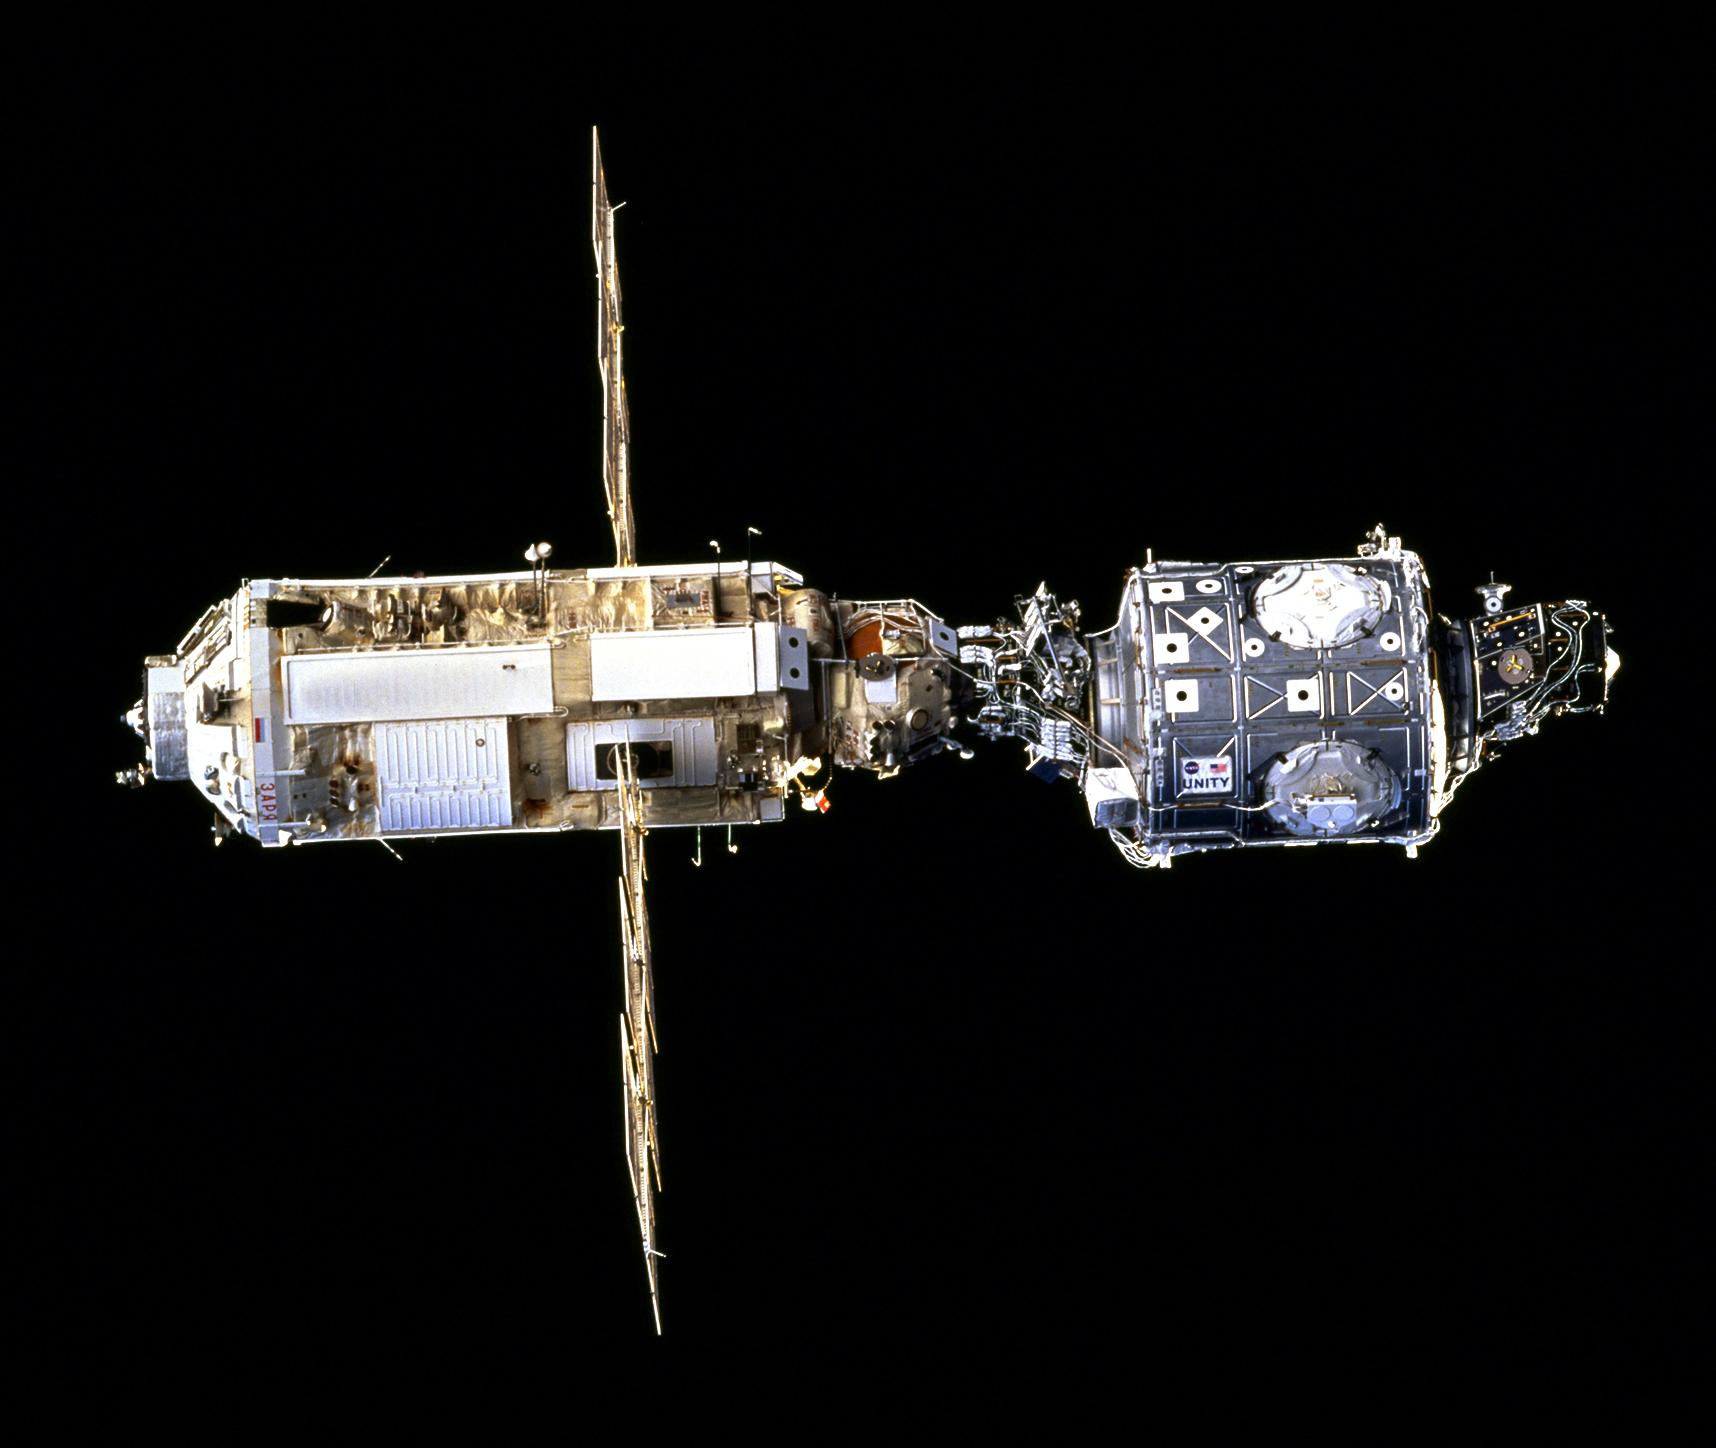 International space station harrisonruess for When was the international space station built